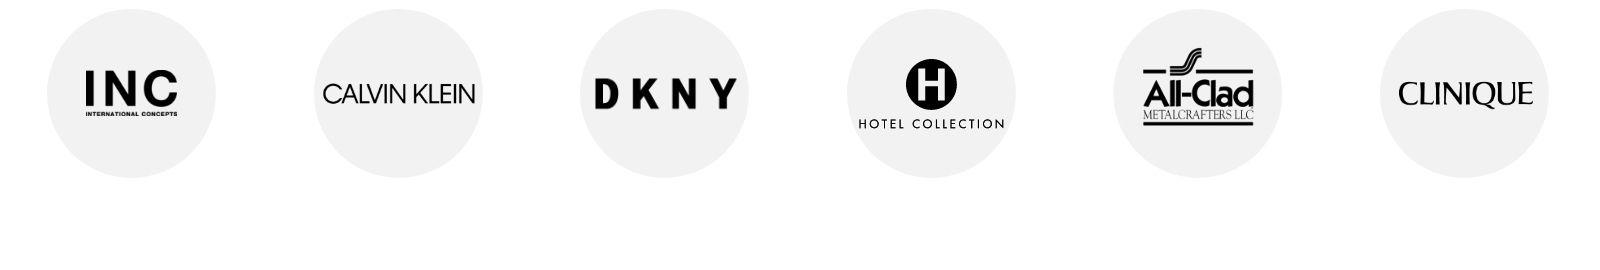 INC, Calvin Klein, D K N Y, Hotel Collection, All-Clad, Clinique